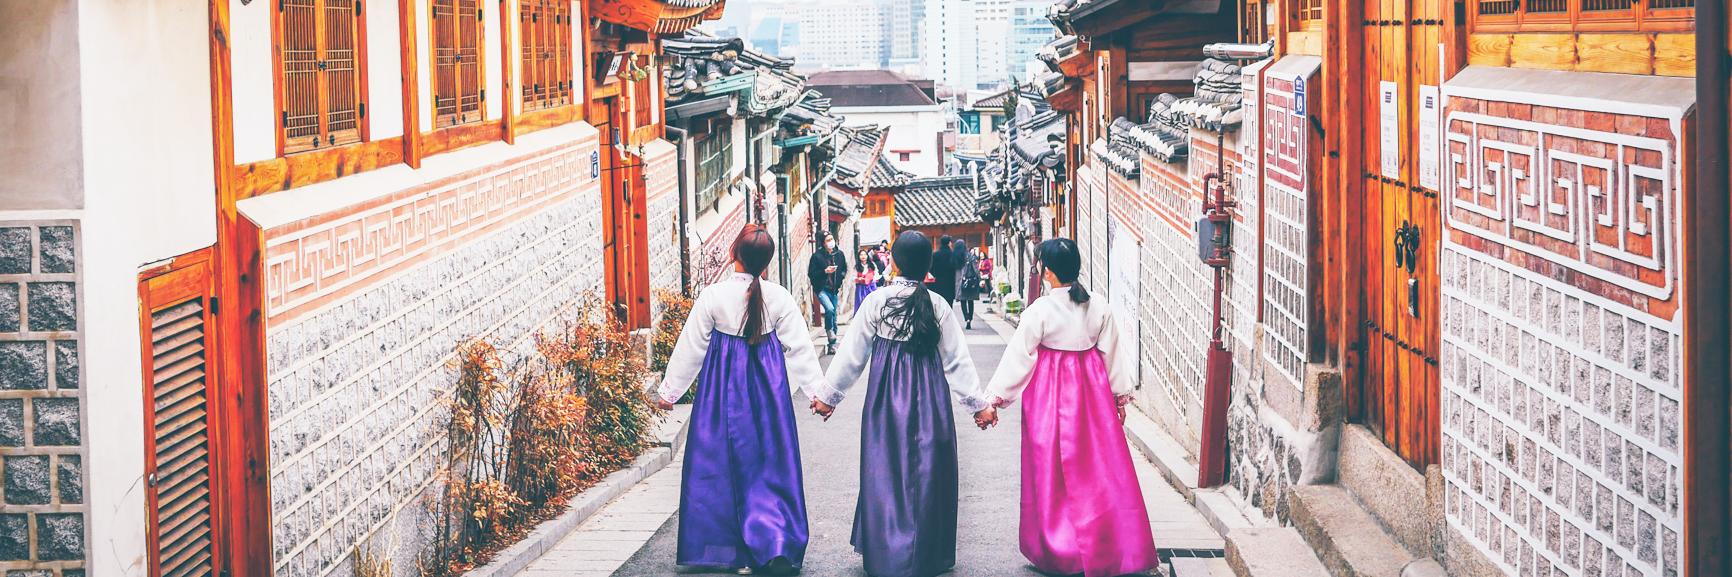 https://gody.vn/blog/quynhnhu/post/lac-loi-o-10-dia-diem-song-ao-ngan-like-o-xu-so-kimchi-han-quoc-932